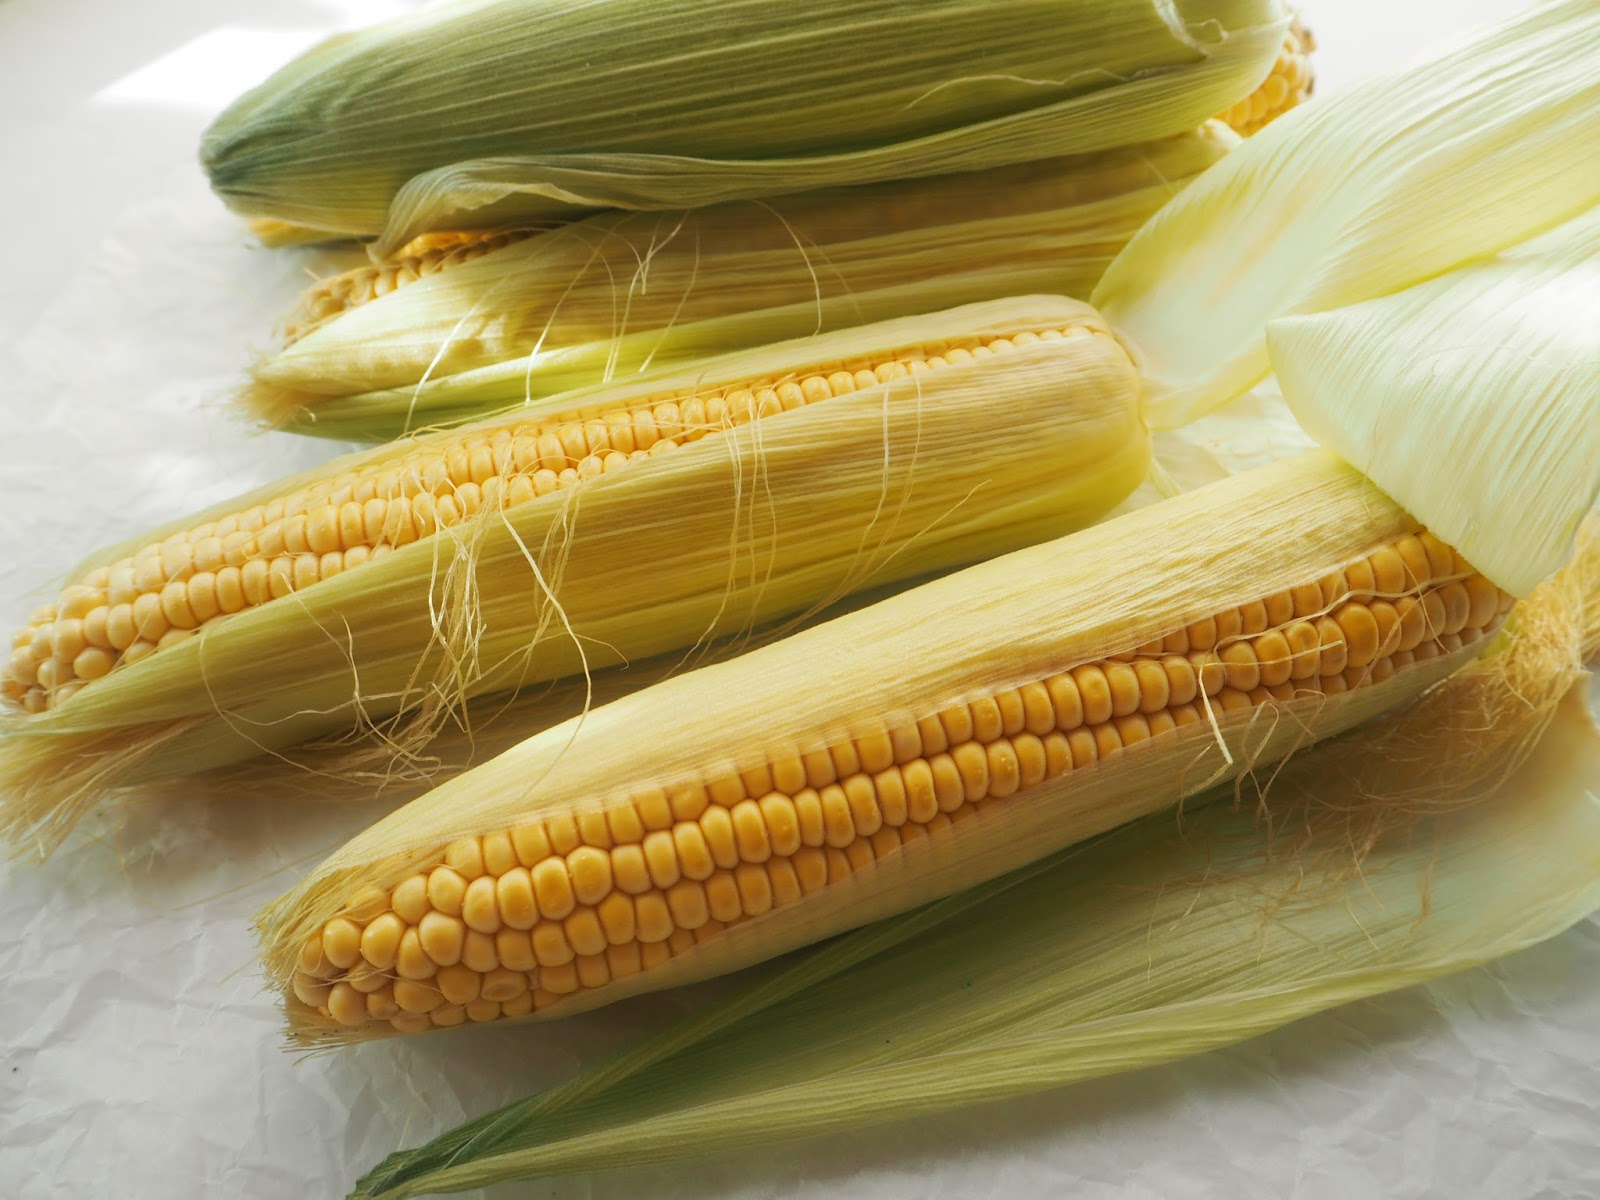 Maissista